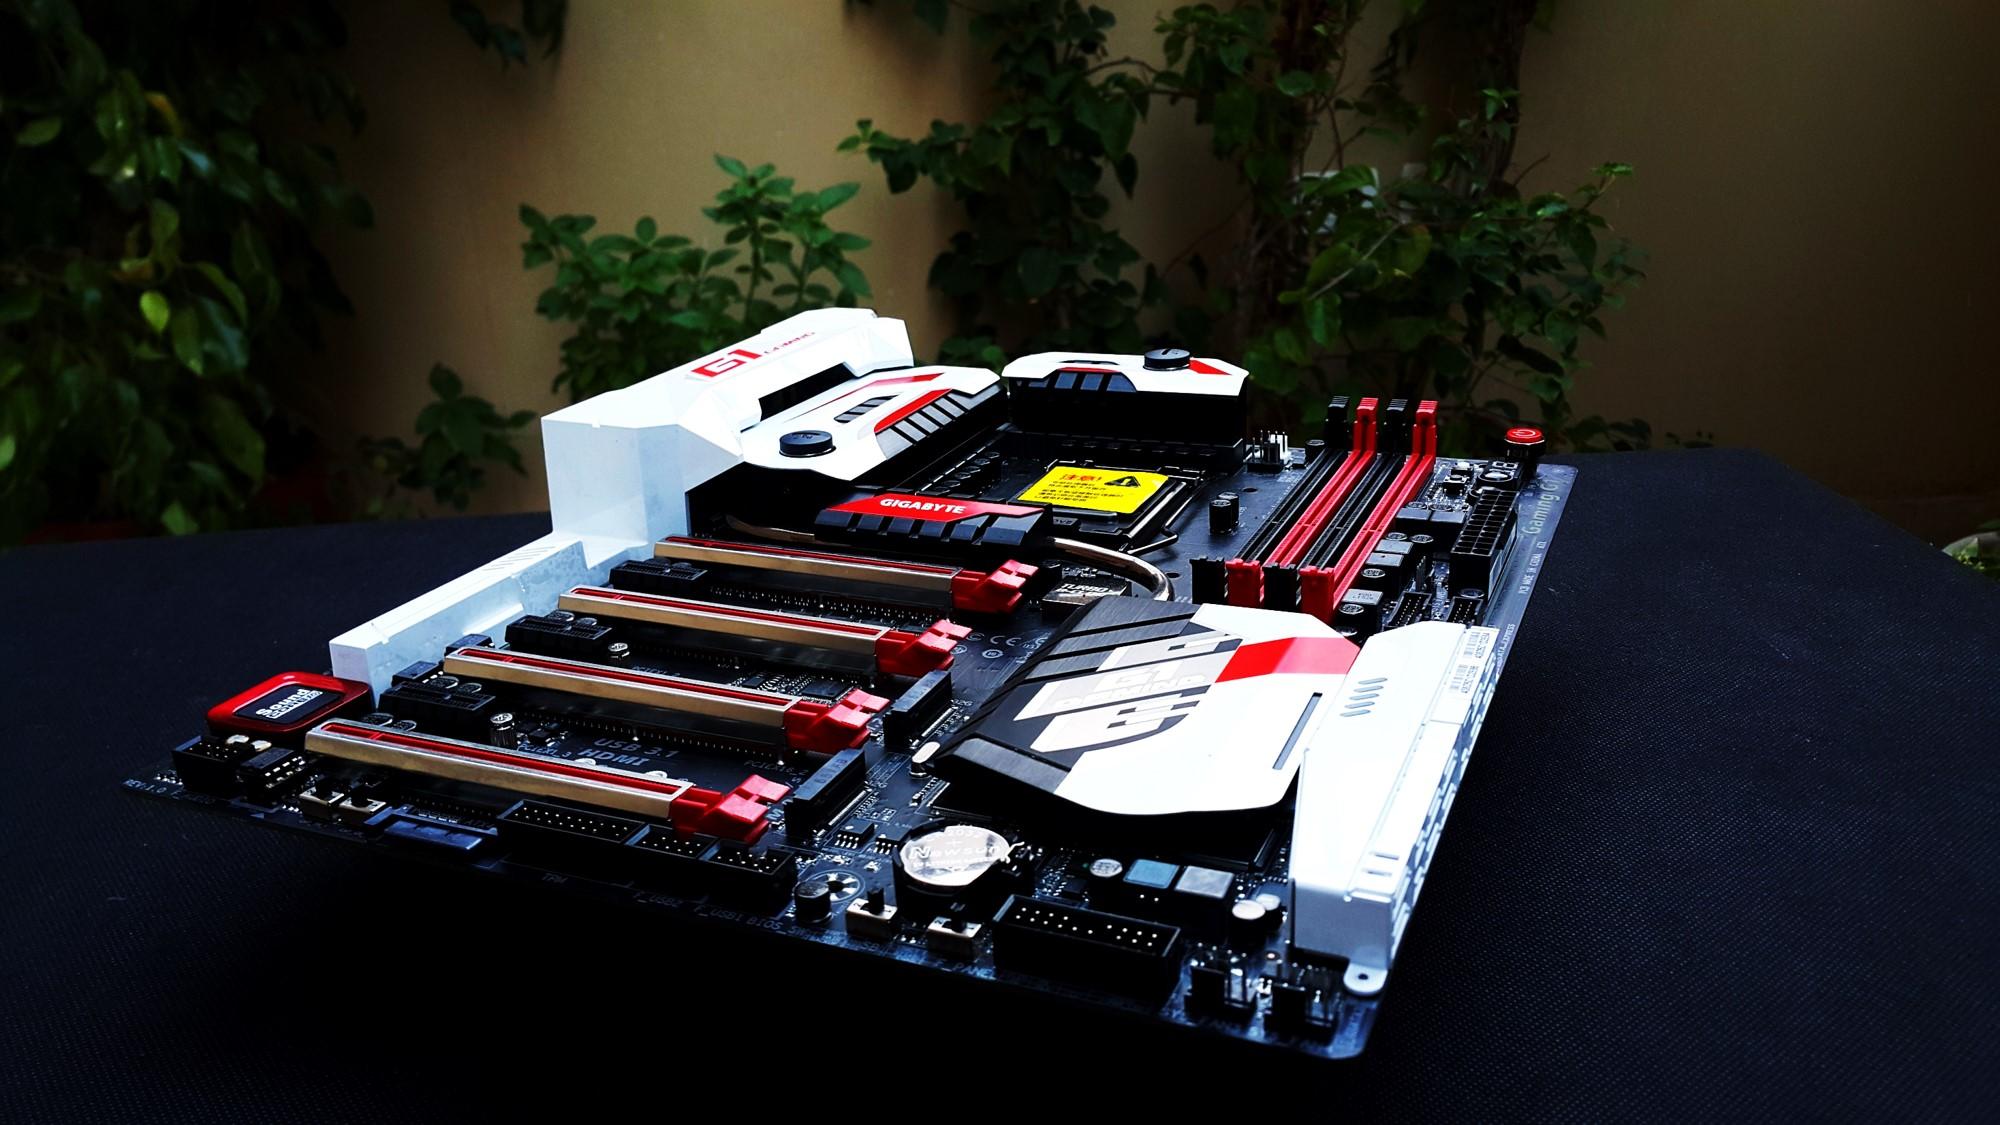 Gigabyte Z170X Gaming G1 Front